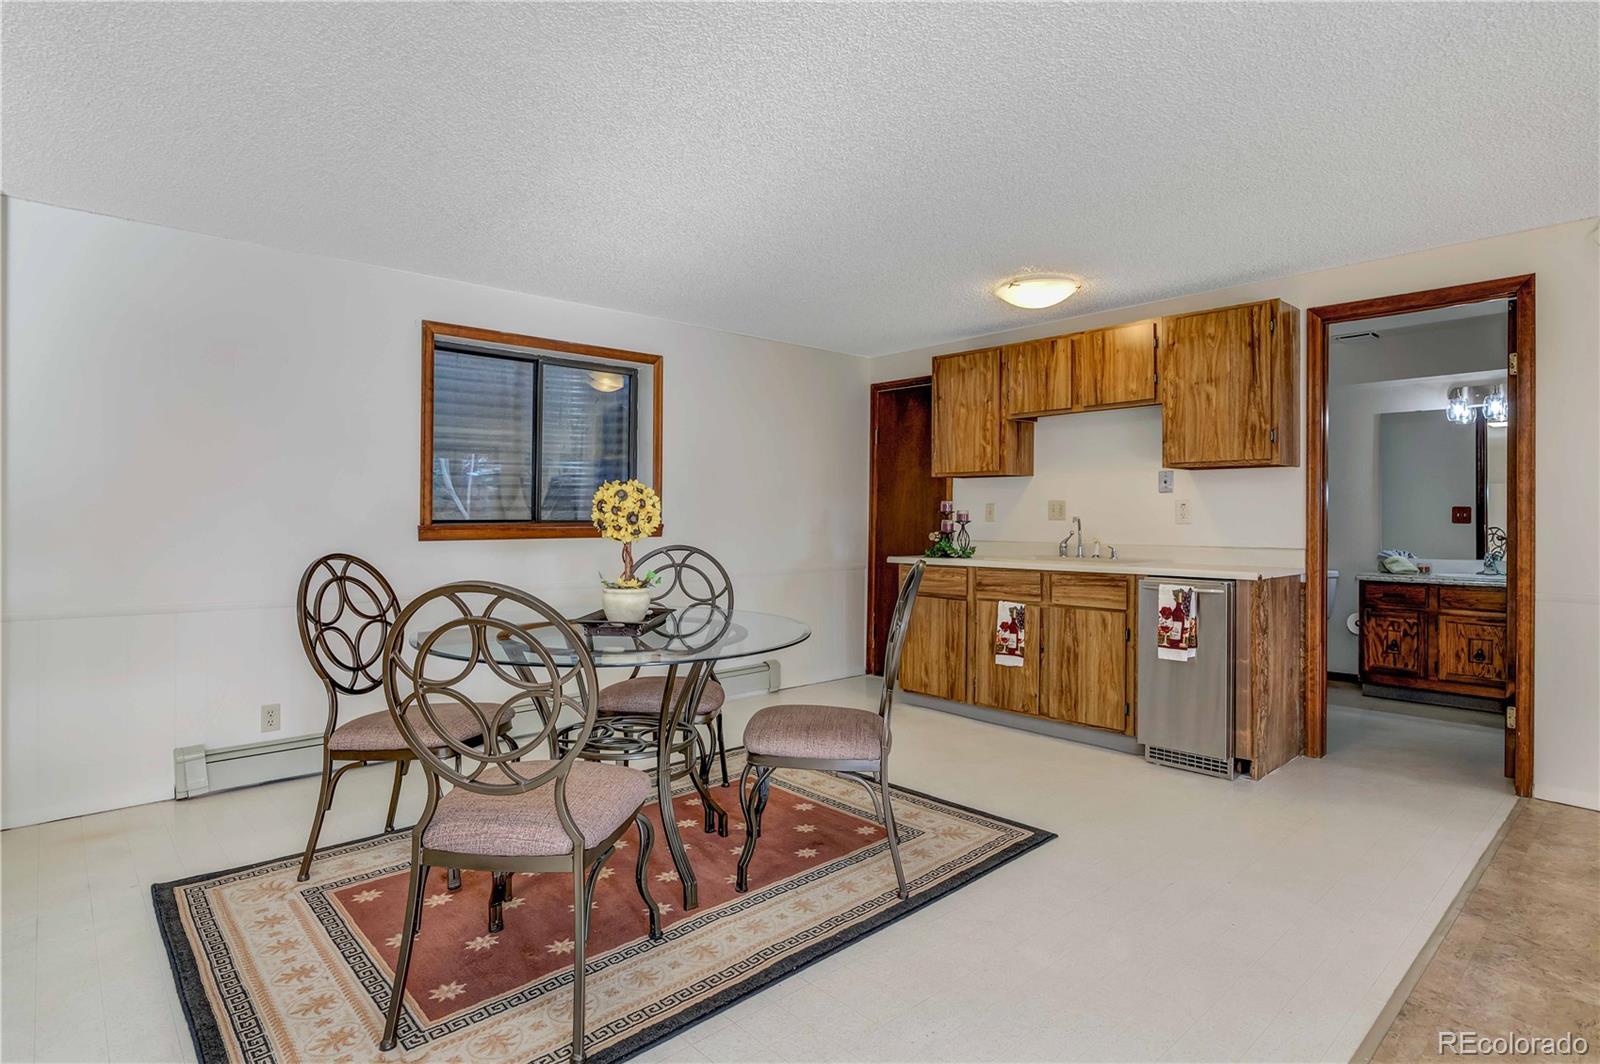 MLS# 5539974 - 24 - 5505 Saddle Rock Place, Colorado Springs, CO 80918